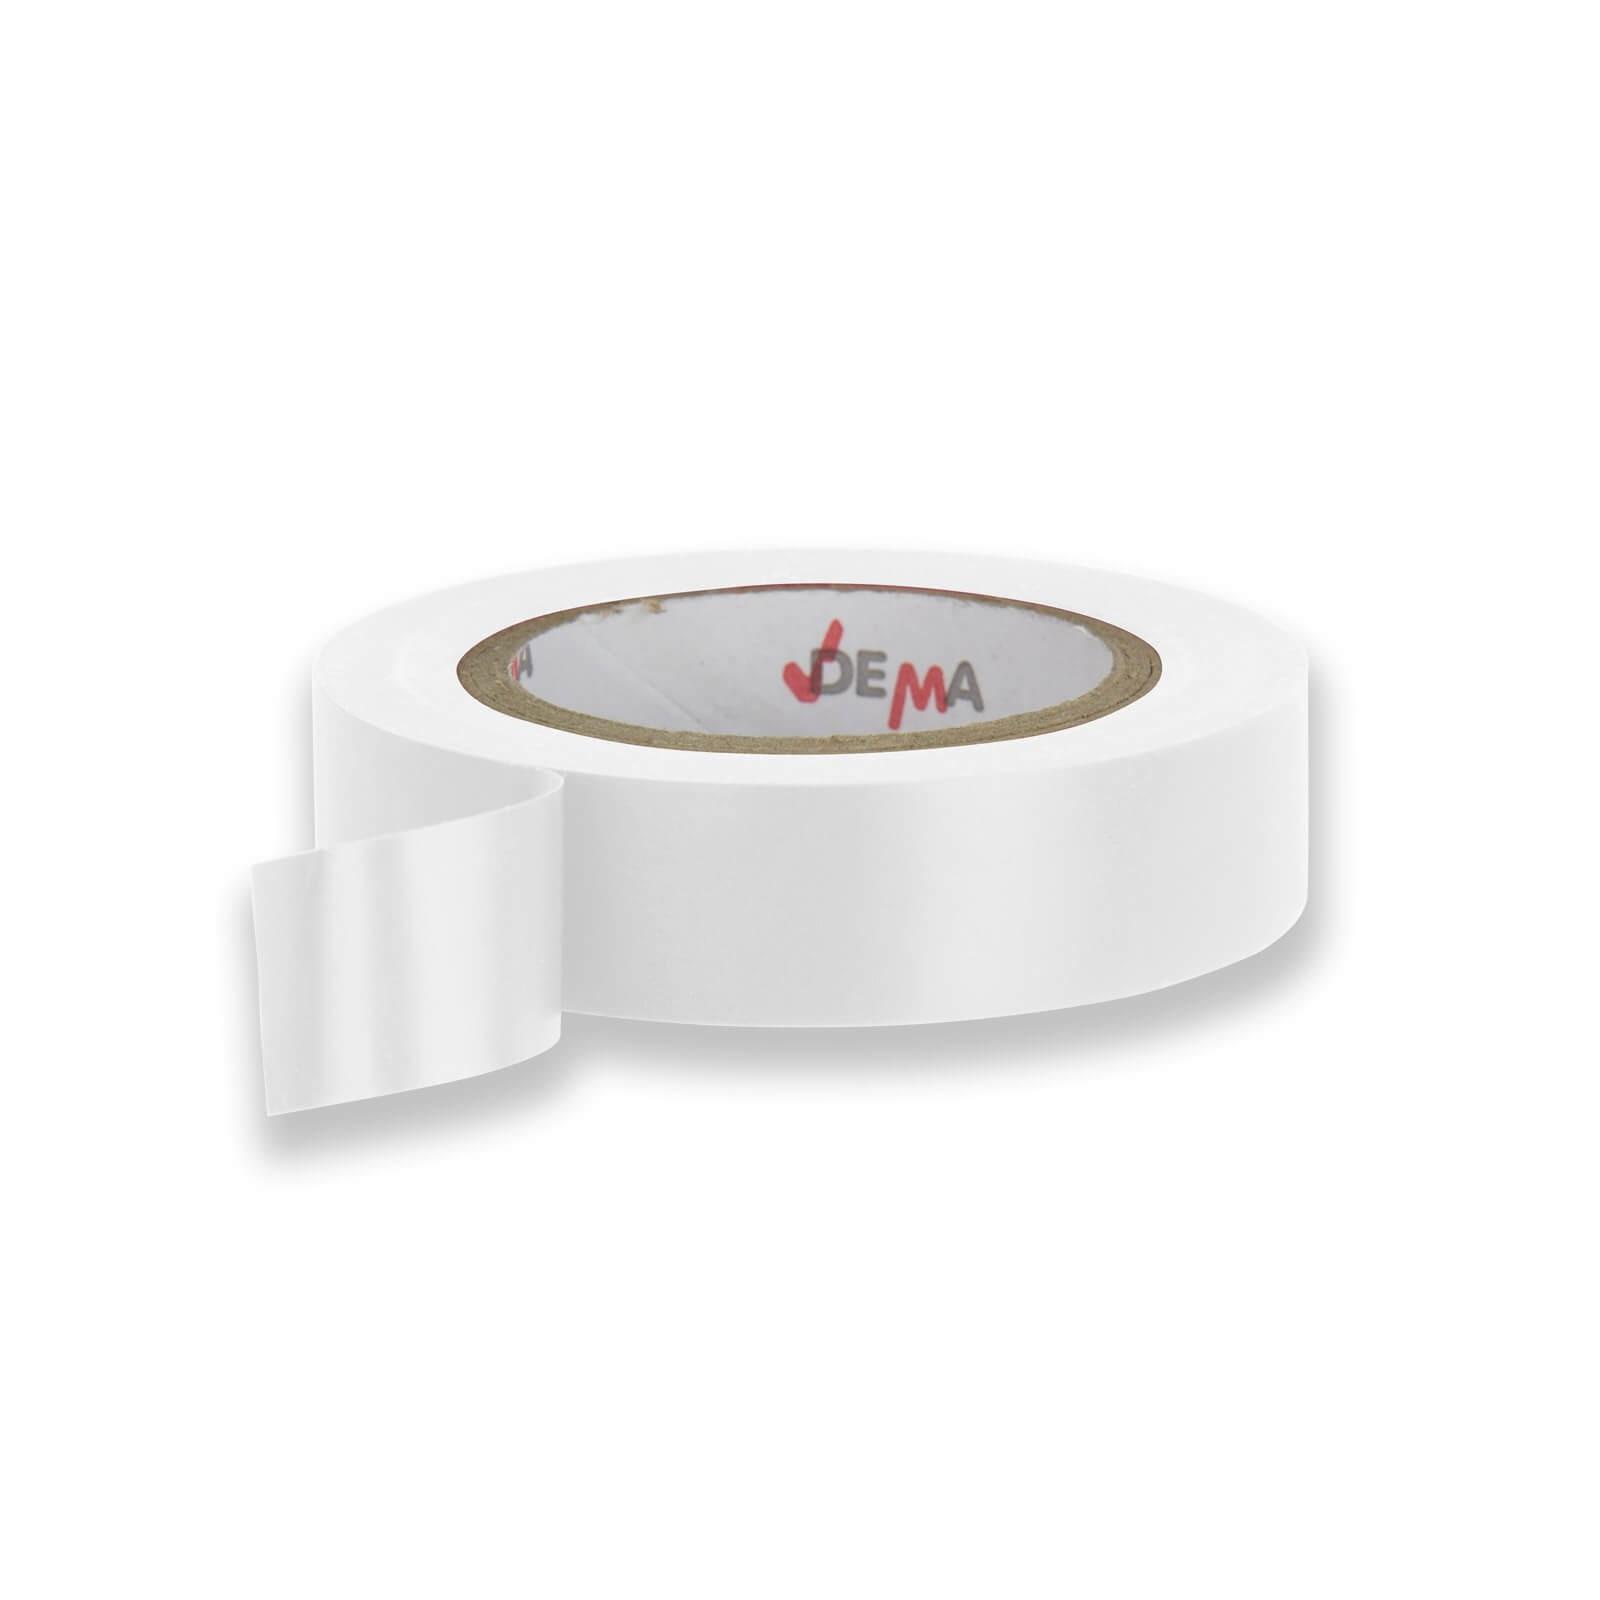 Dema Elektriker Isolierband 15 mm x 10 m - Farbe nach Wahl var-isolierband